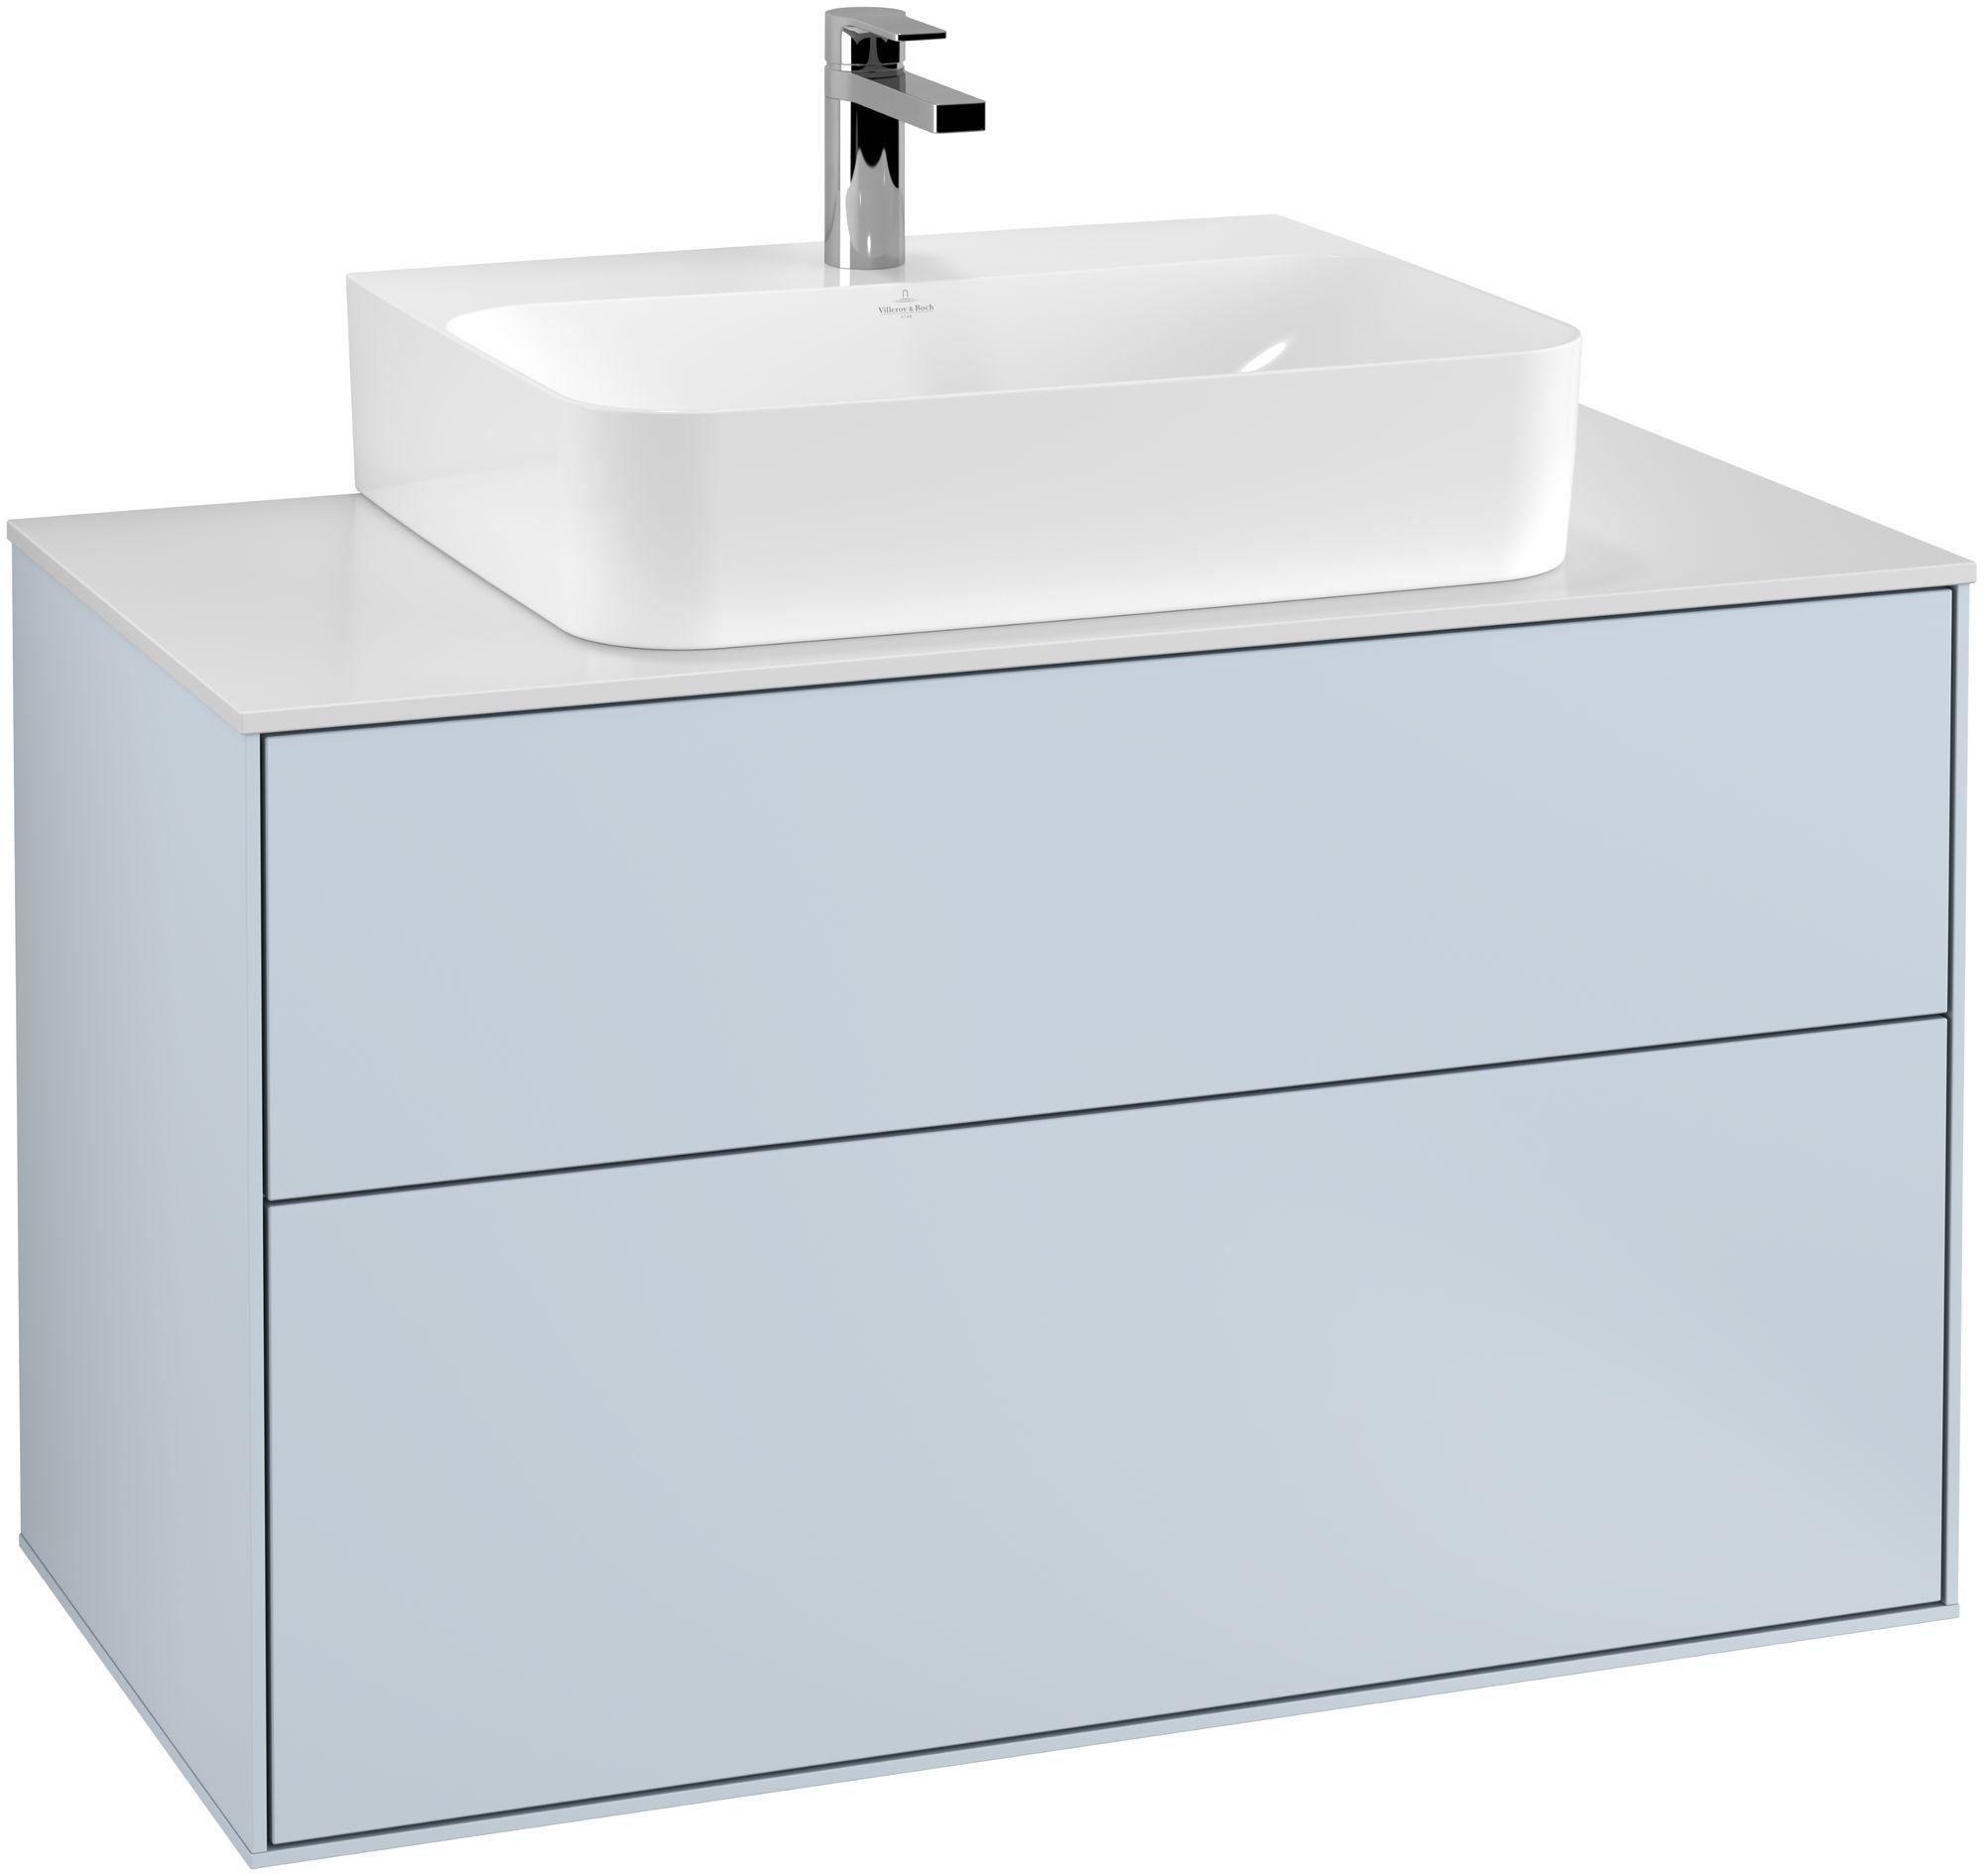 Villeroy & Boch Finion G10 Waschtischunterschrank 2 Auszüge Waschtisch mittig LED-Beleuchtung B:100xH:60,3xT:50,1cm Front, Korpus: Cloud, Glasplatte: White Matt G10100HA